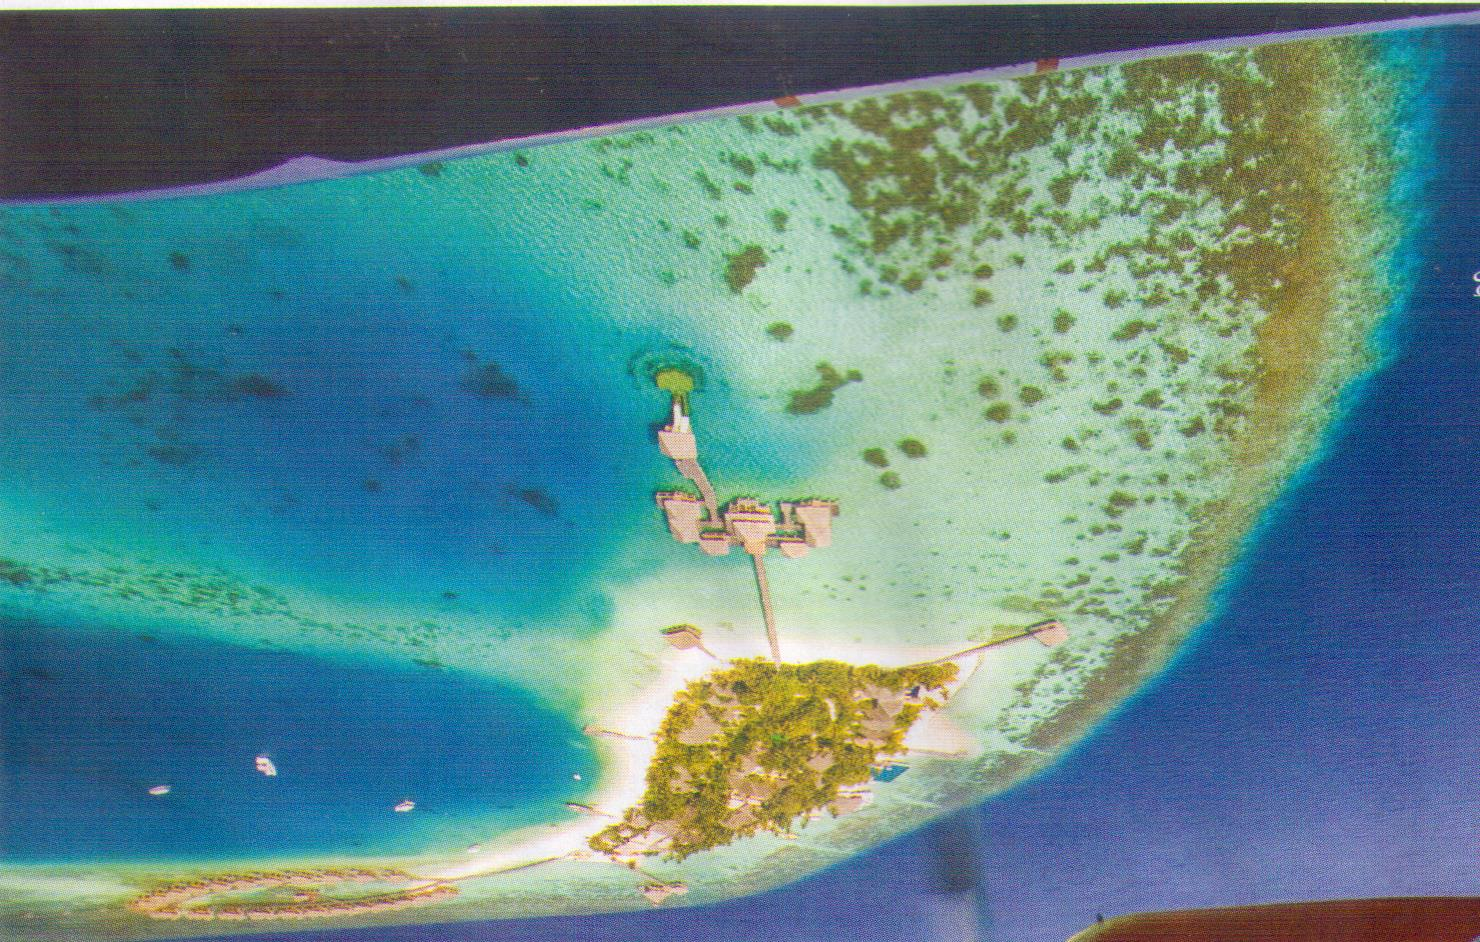 Click image for larger version  Name:Maldives resort.jpeg Views:67 Size:334.2 KB ID:99981